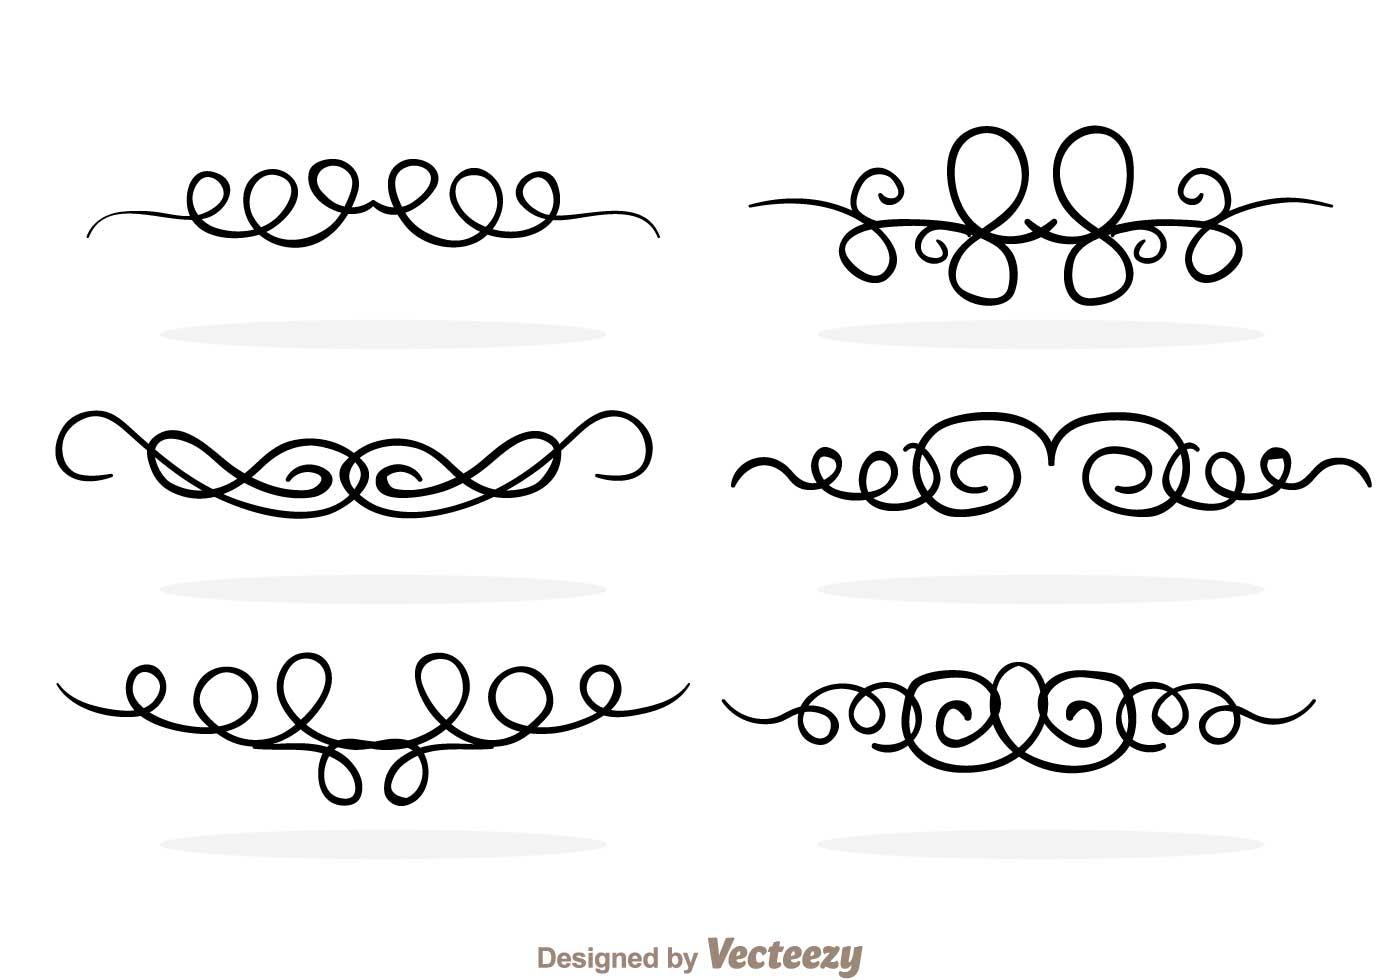 1400x980 Swirly Lines Free Vector Art